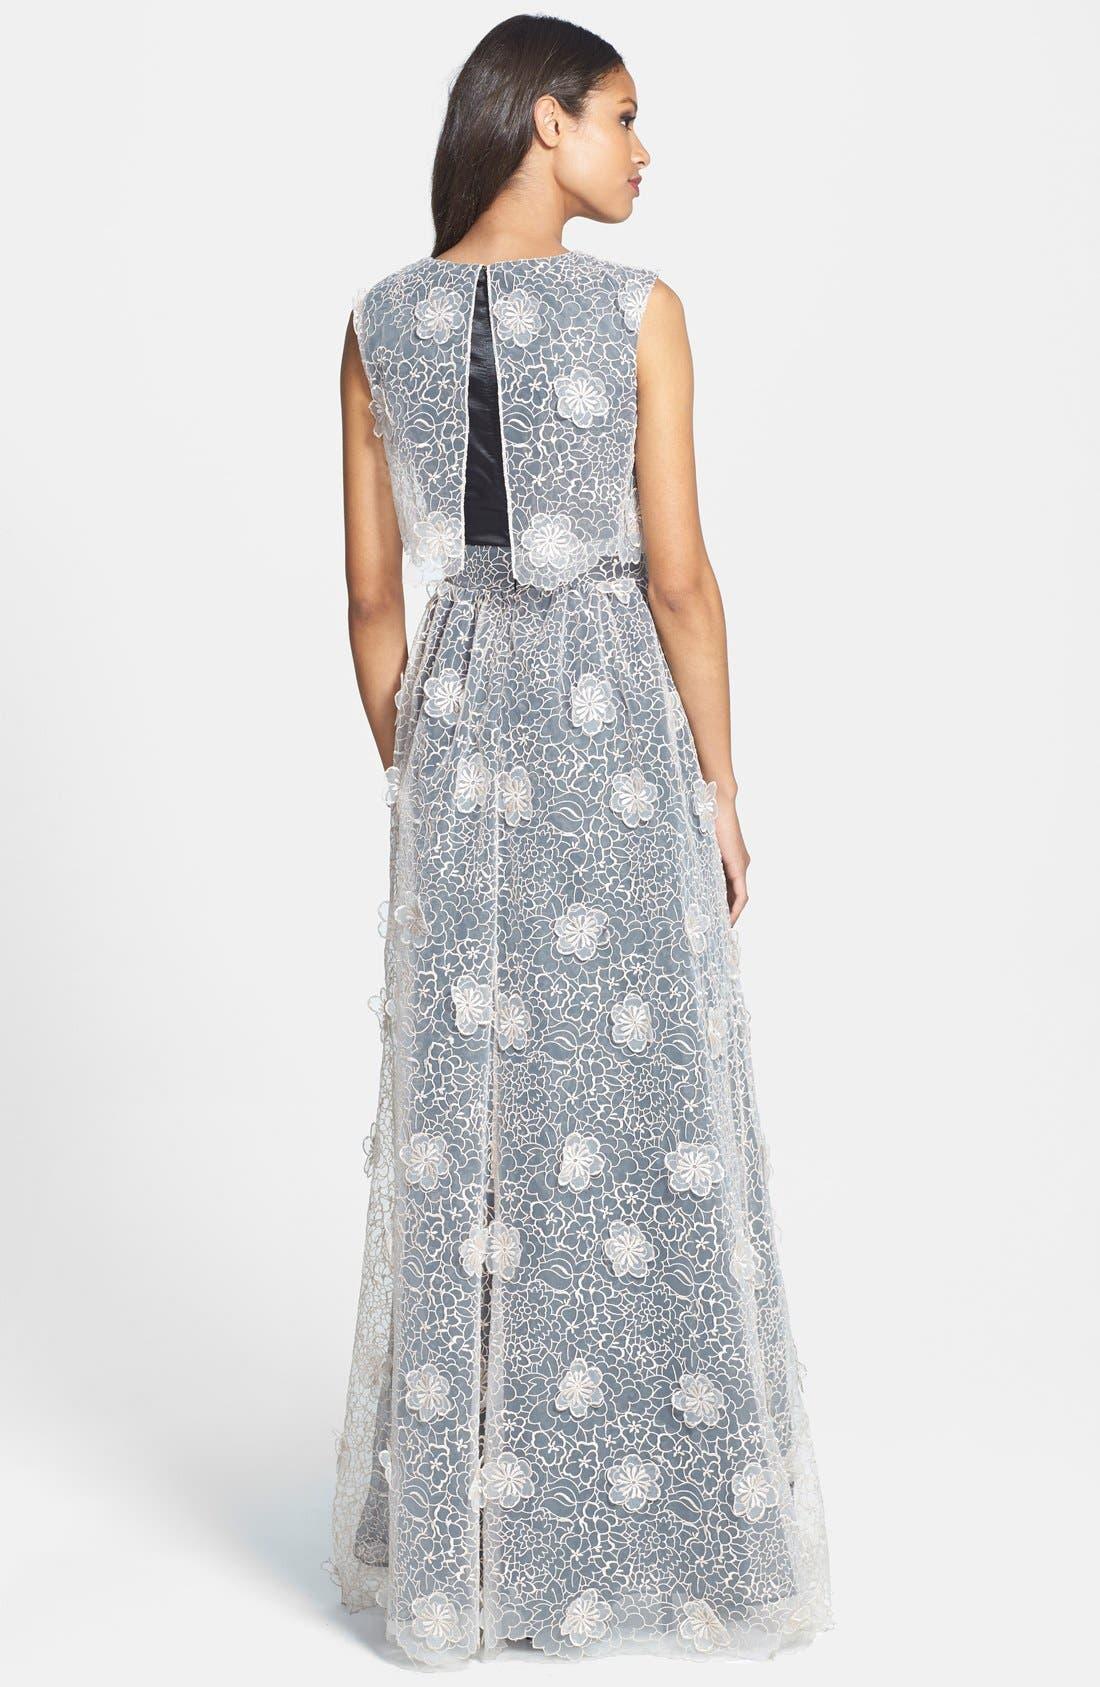 ERIN ERIN FETHERSTON, 'Jan' 3D Floral Organza Gown, Alternate thumbnail 3, color, 687